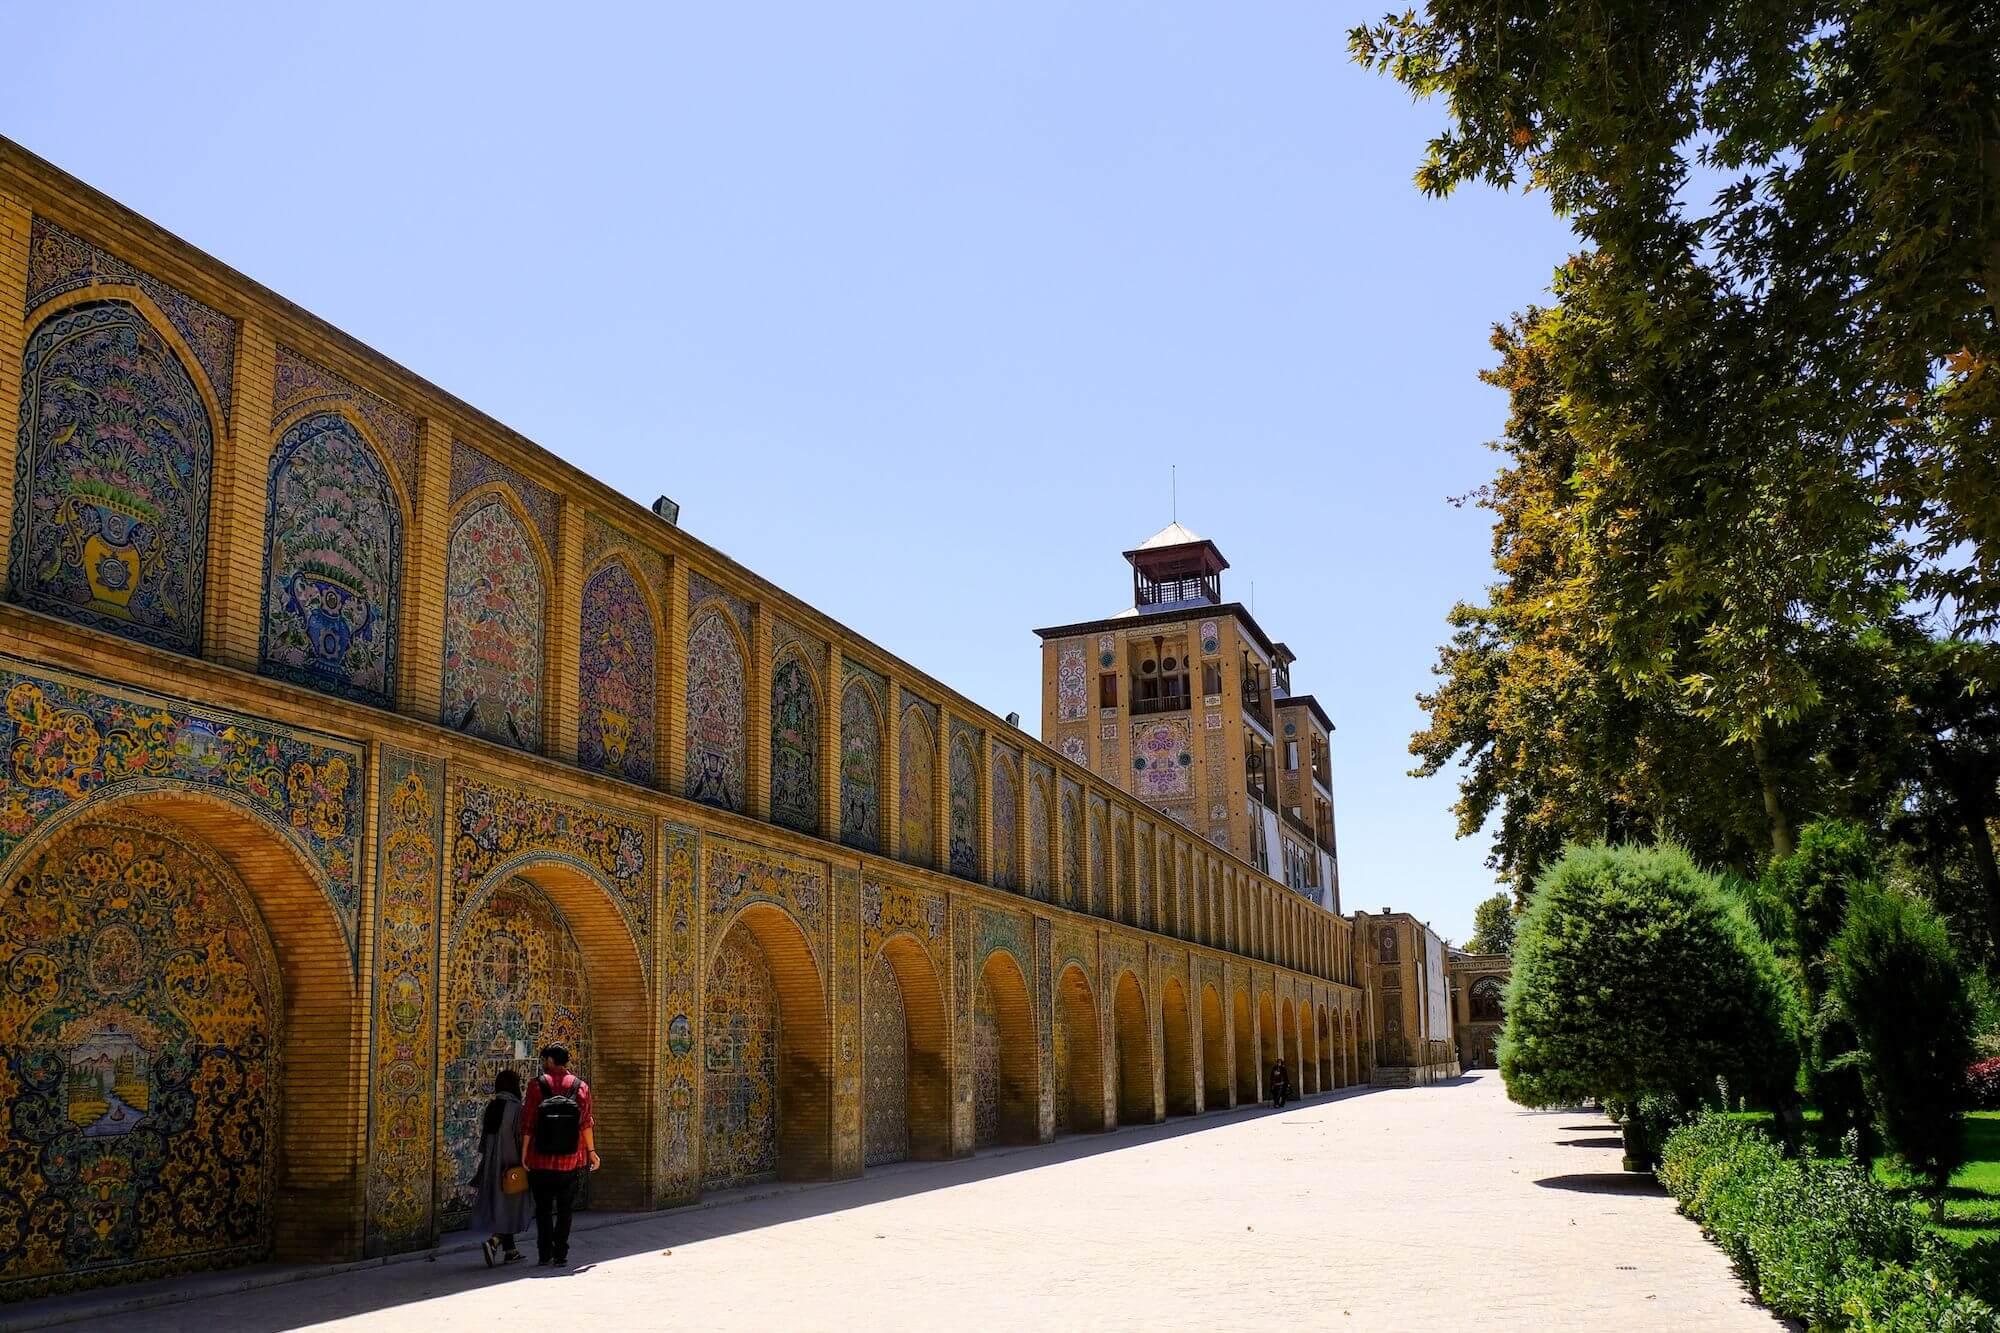 Teheran Golestan Palace 1 compressor 3 giorni a Teheran